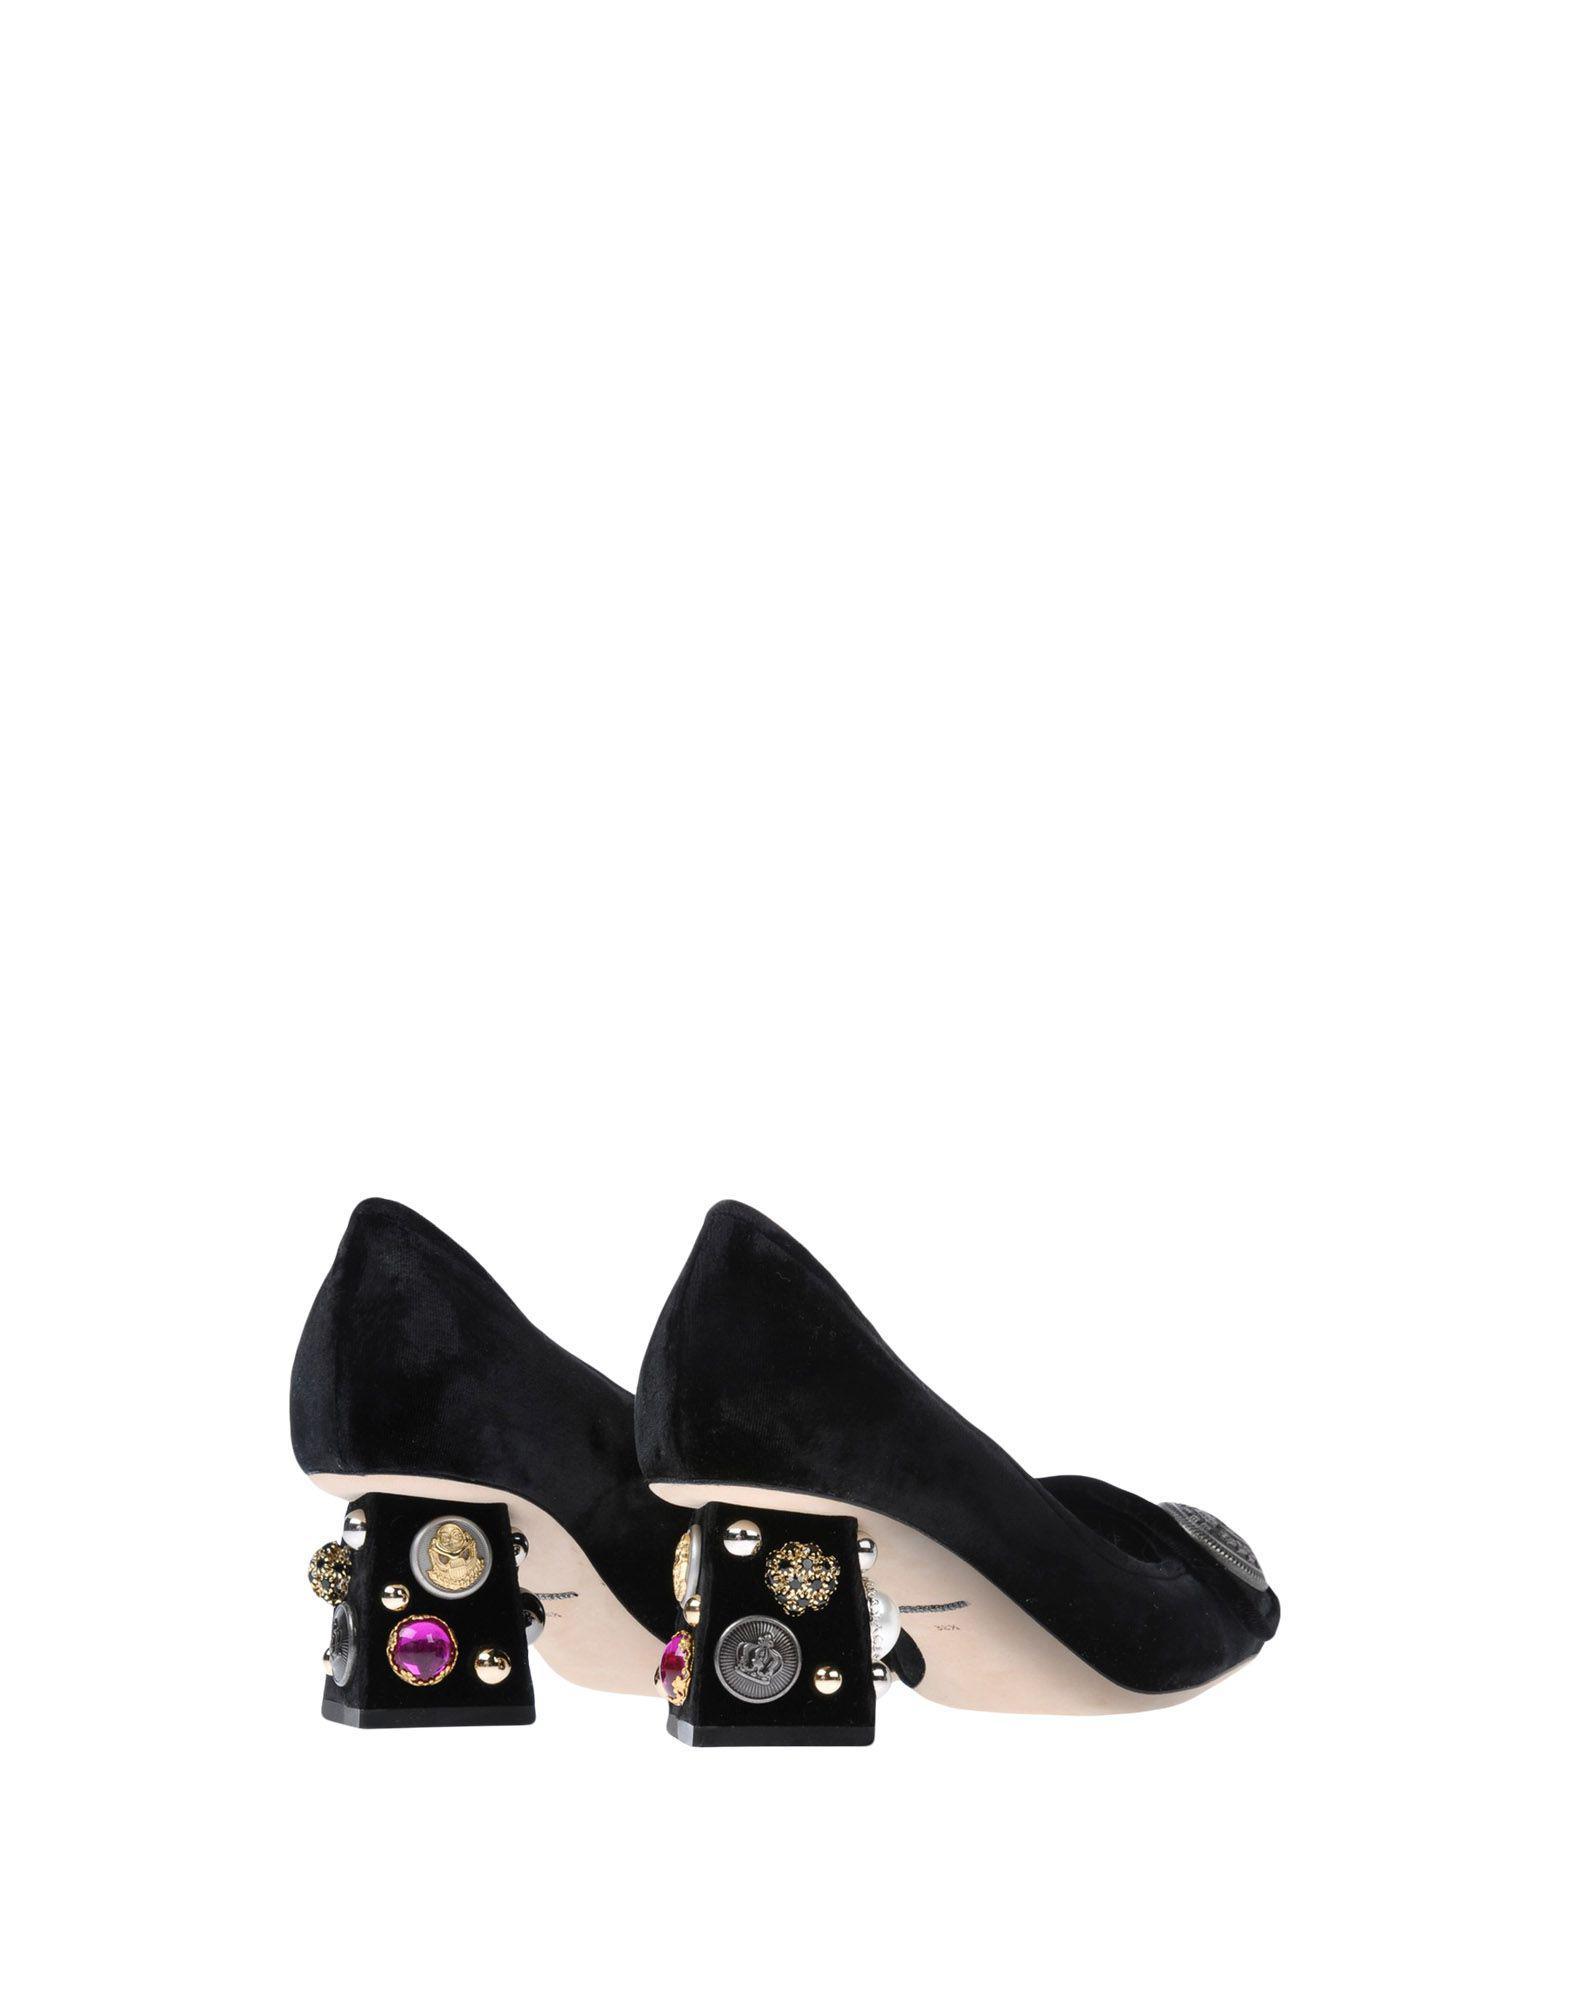 Zapatos de salón Dolce & Gabbana de Cuero de color Negro